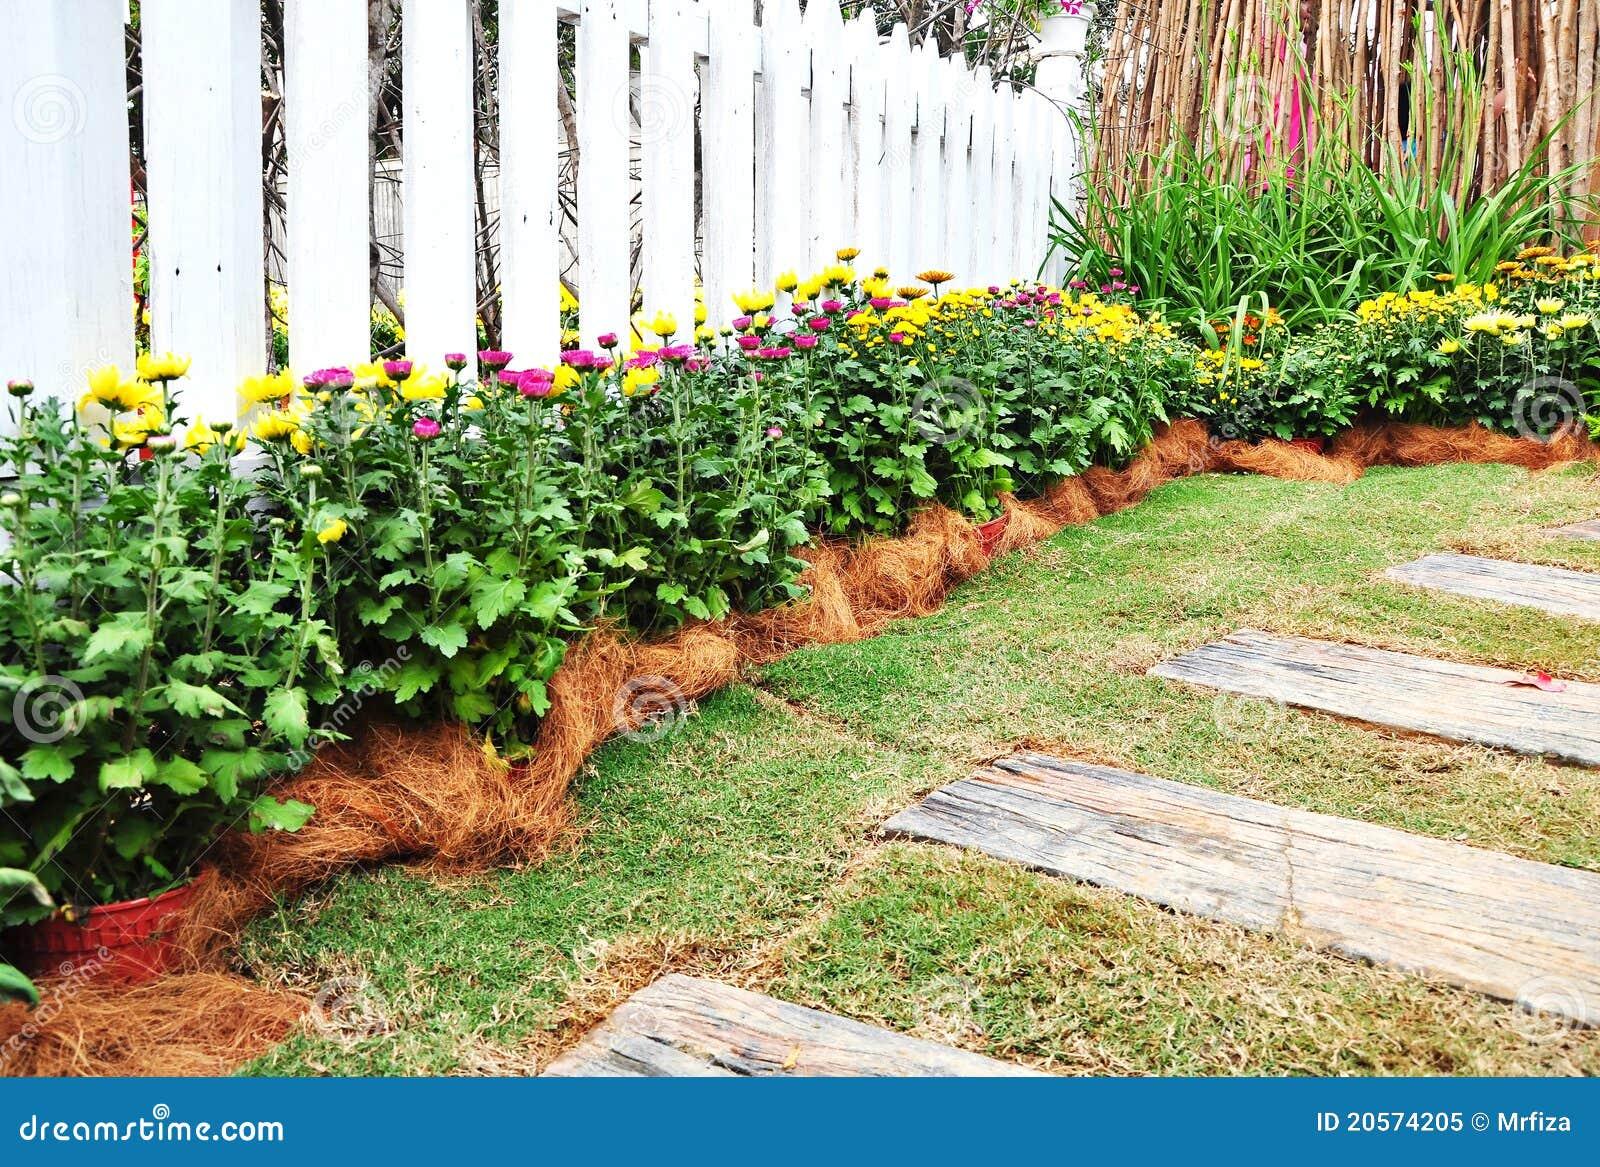 garden concept royalty free stock photo image 20574205. Black Bedroom Furniture Sets. Home Design Ideas